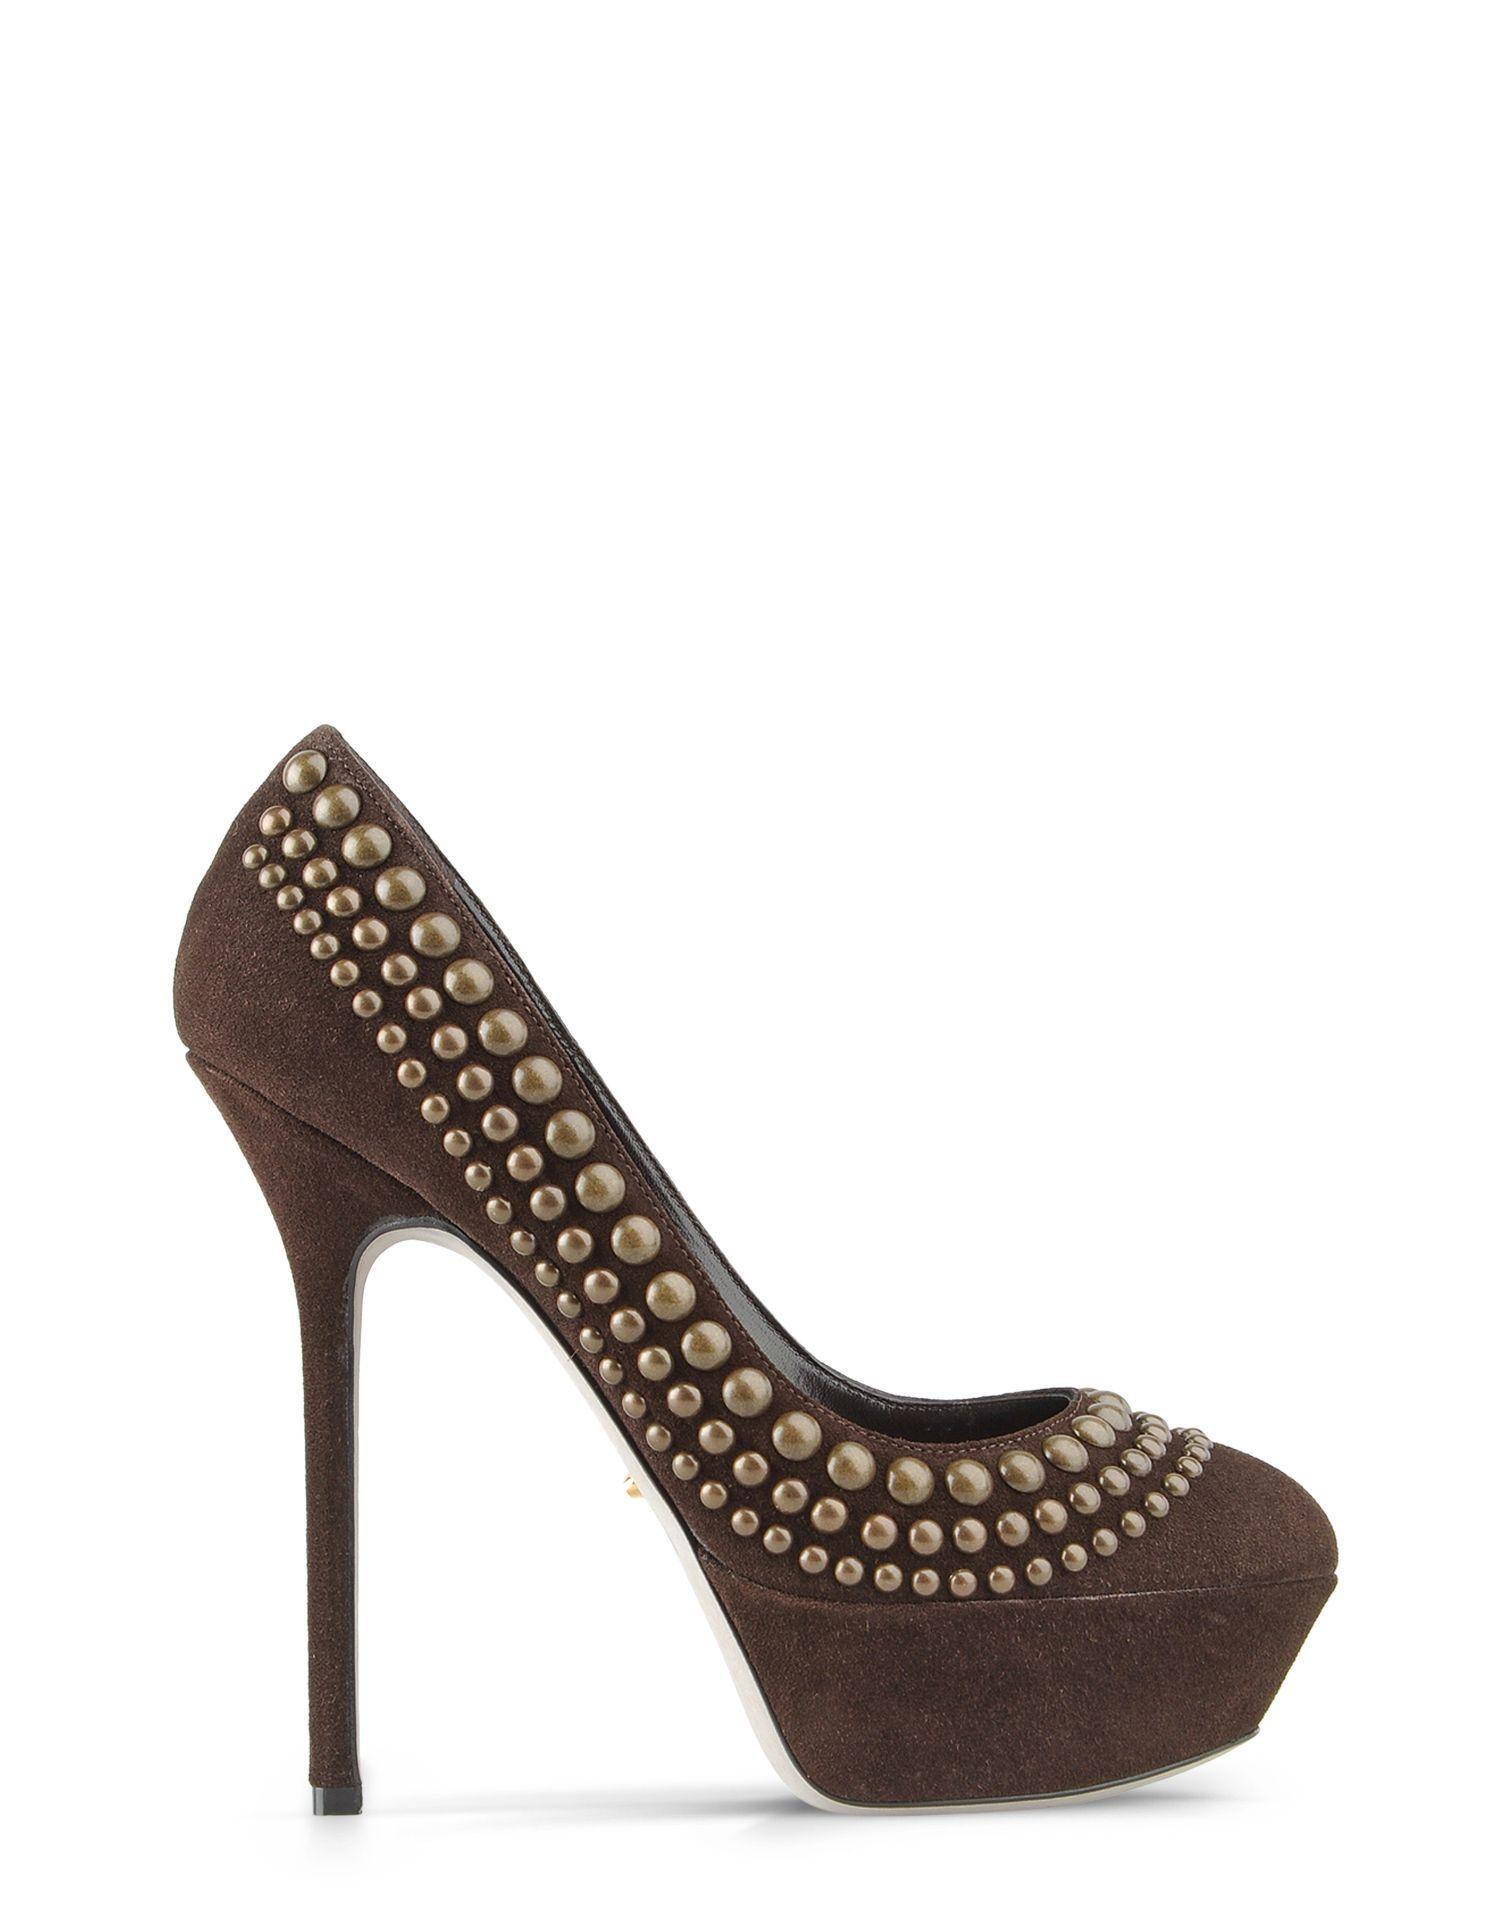 6989b202ae4 Genevieve SERGIO ROSSI | My Style | Sergio rossi shoes, Sergio rossi ...